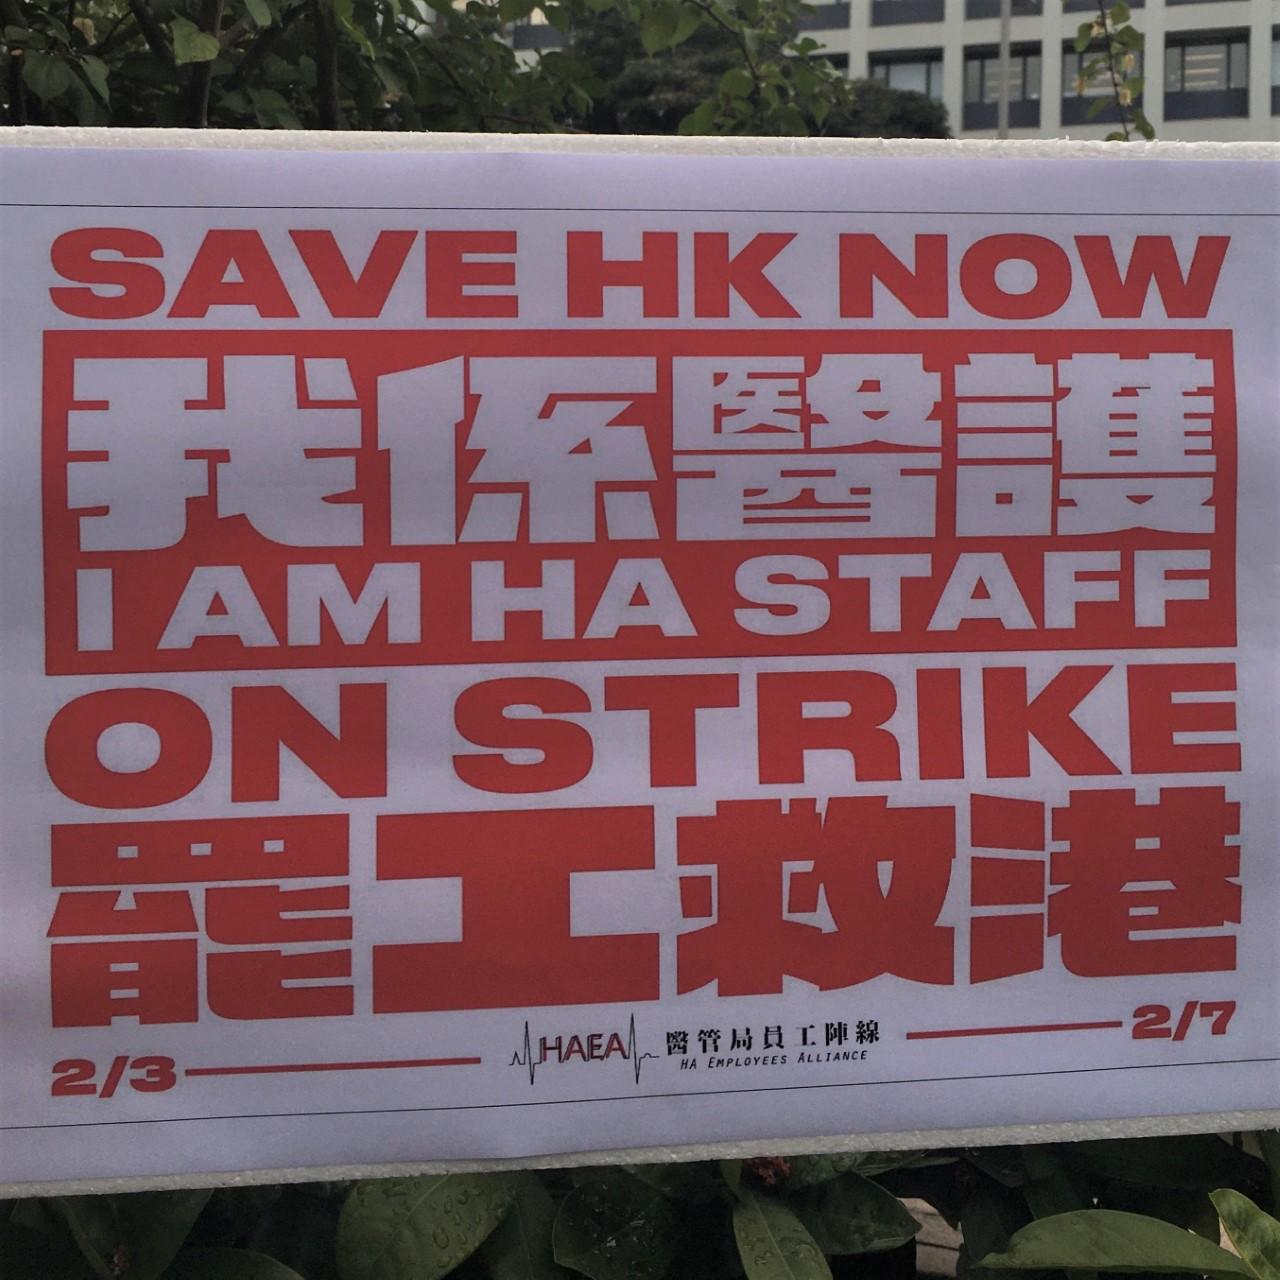 Hospital Authority strike.